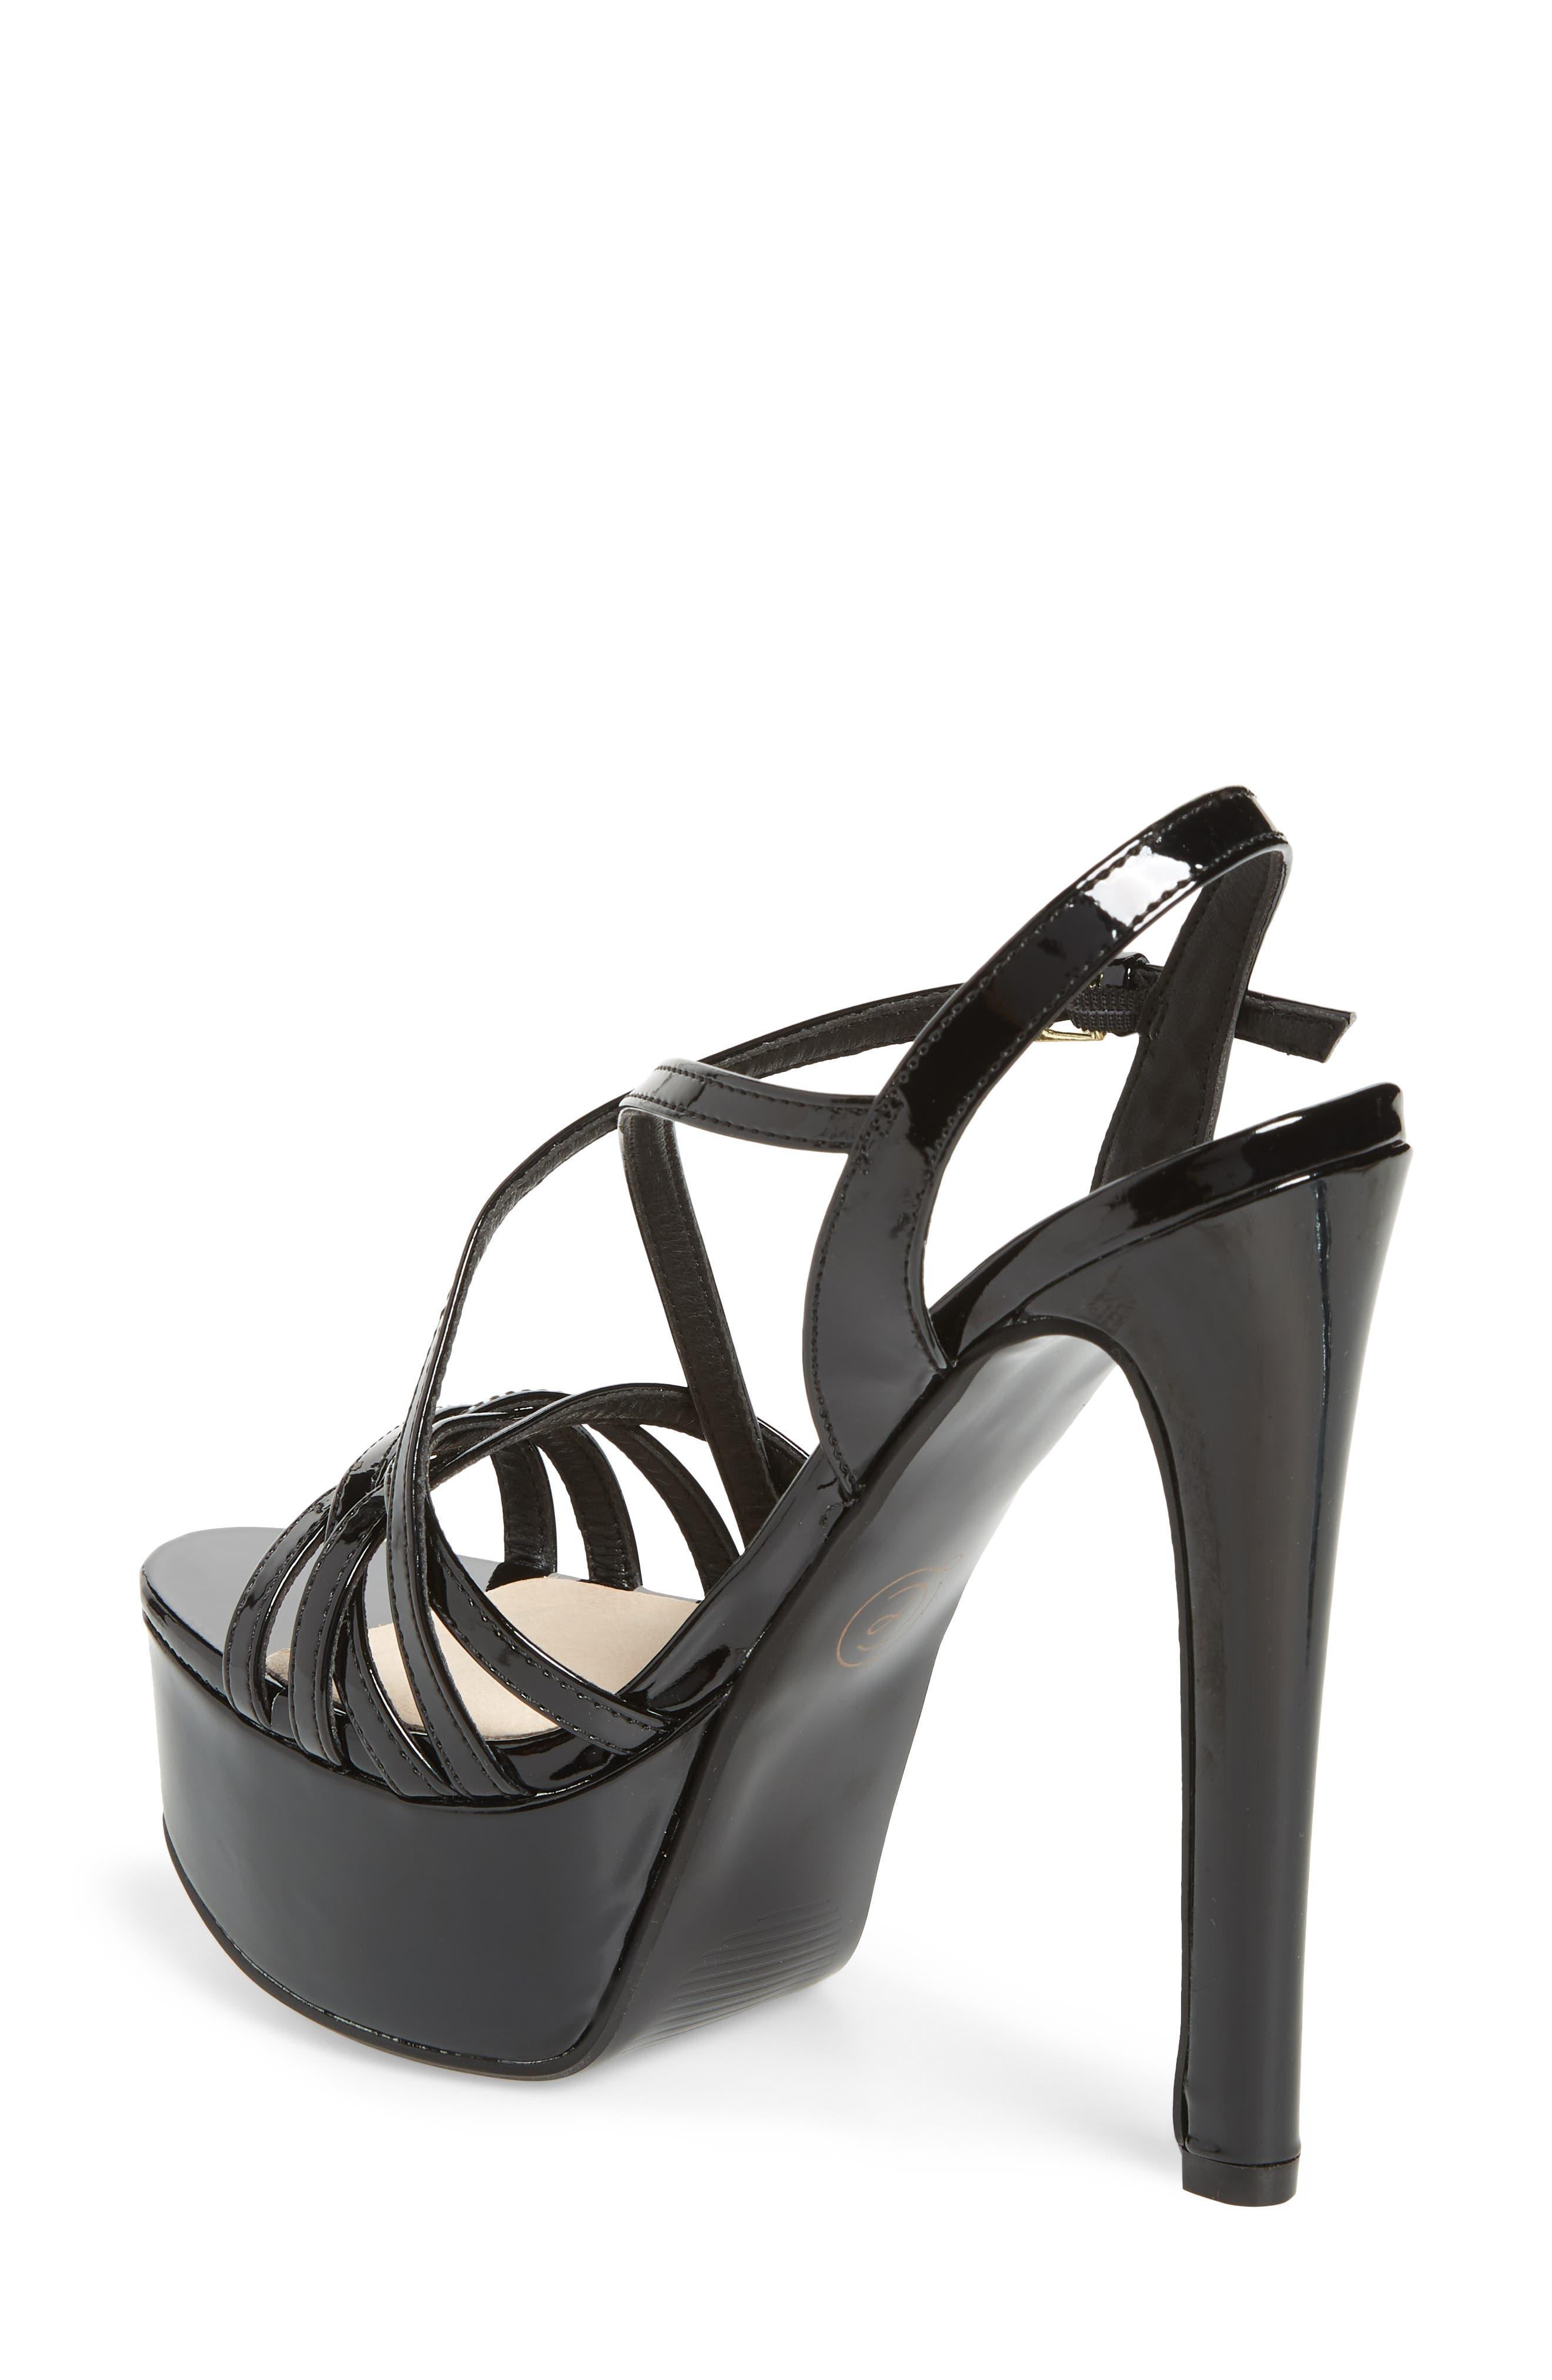 Teaser2 Platform Sandal,                             Alternate thumbnail 2, color,                             BLACK PATENT